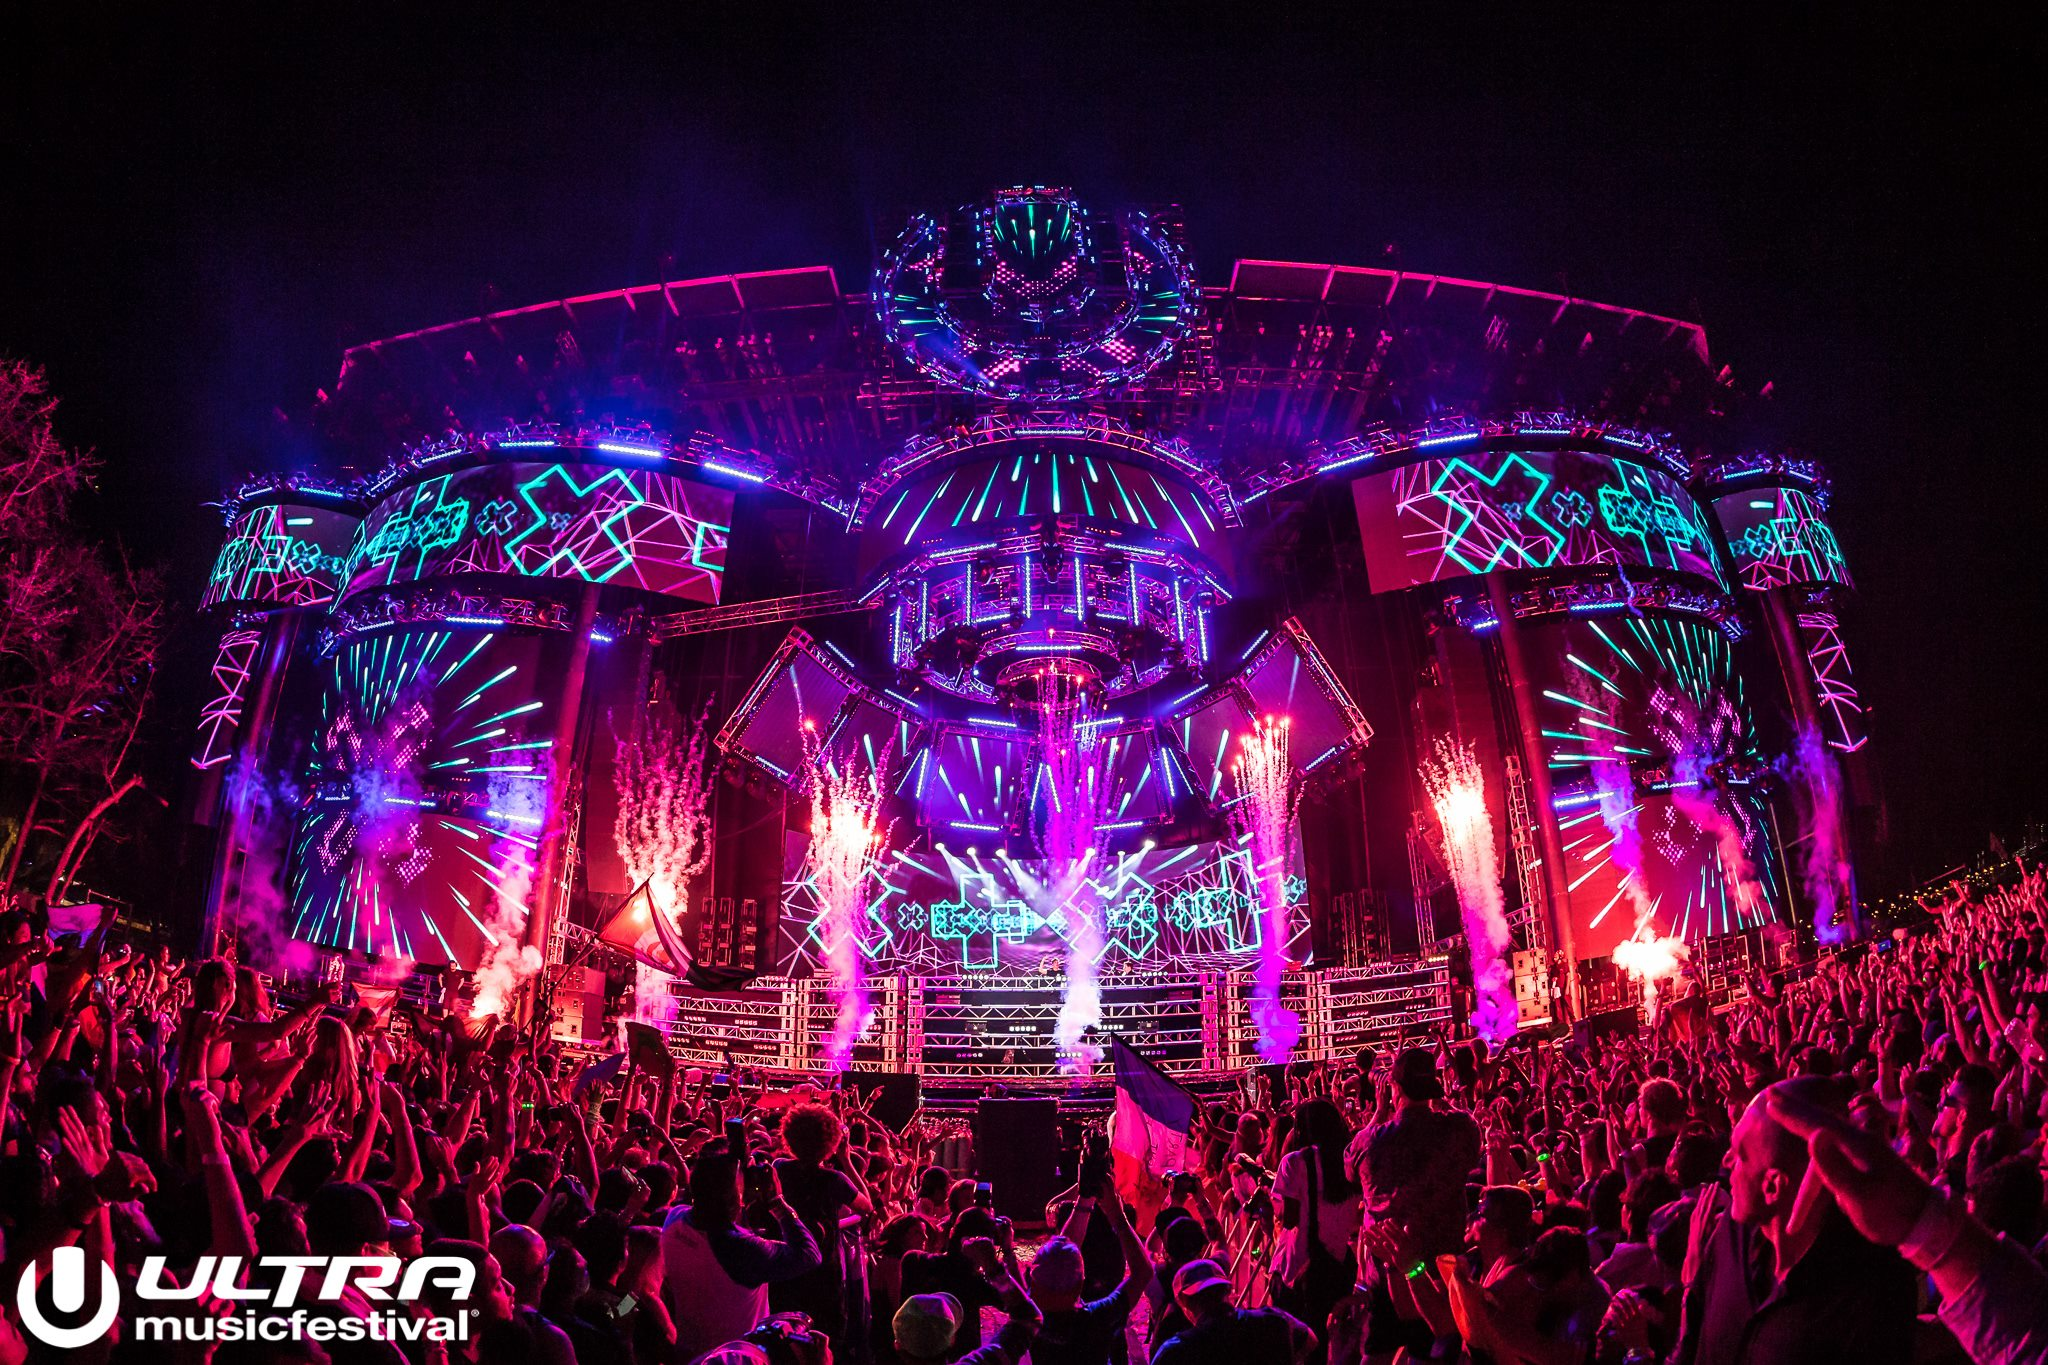 Ultra Music Festival Backgrounds, Compatible - PC, Mobile, Gadgets  2048x1365 px